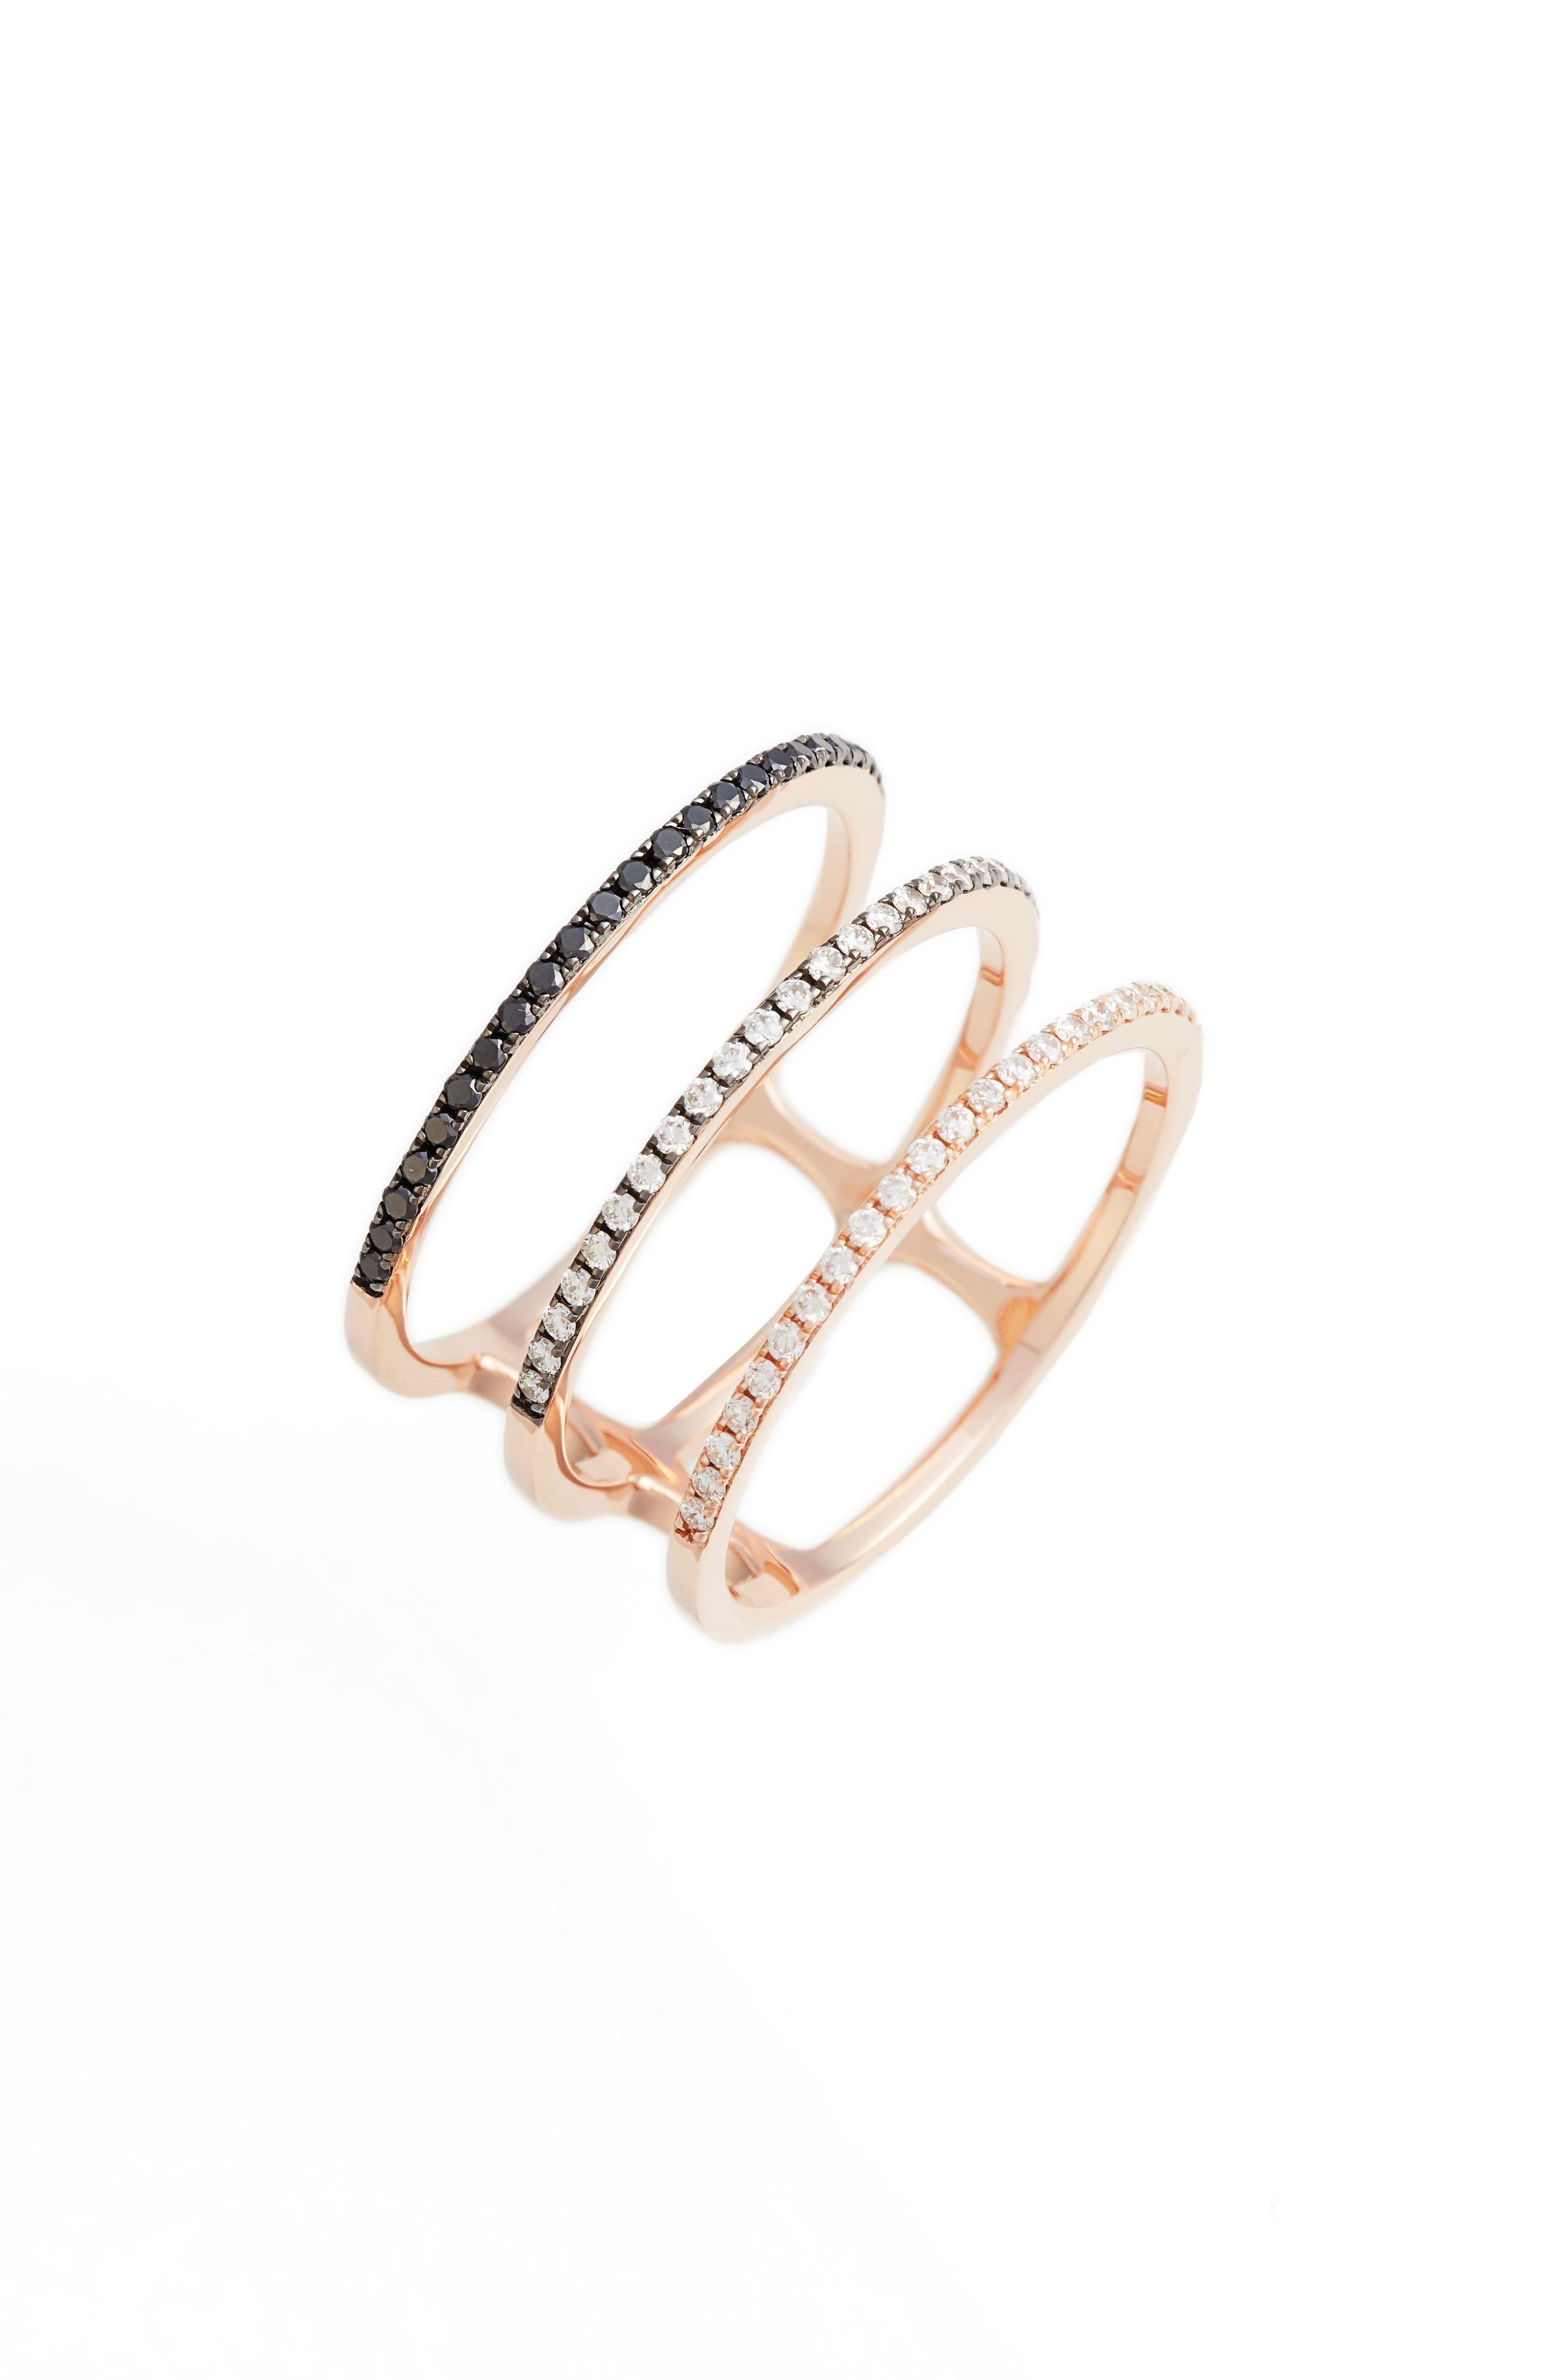 Diamond Triple Fade Stacking Ring,                             Main thumbnail 1, color,                             ROSE GOLD